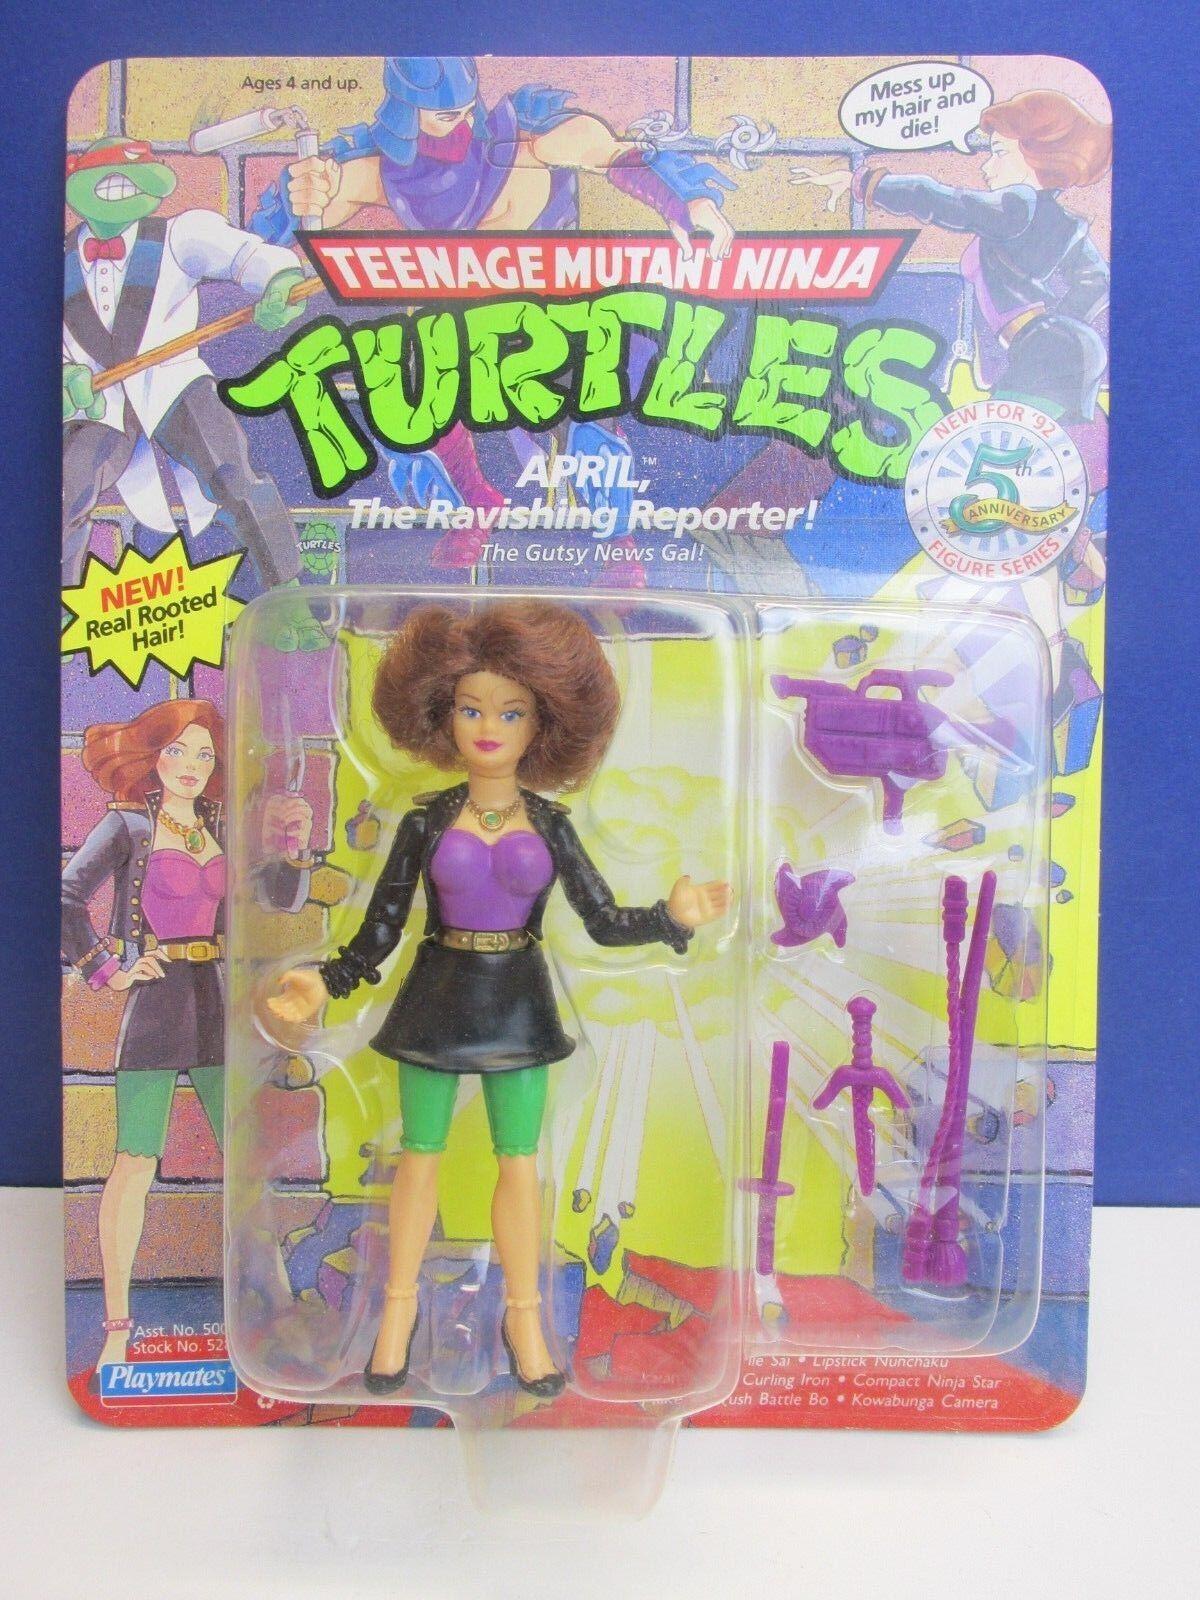 Teenage MUTANT NINJA TURTLES TMNT affascinante REPORTER APRILE Action Figure 32z